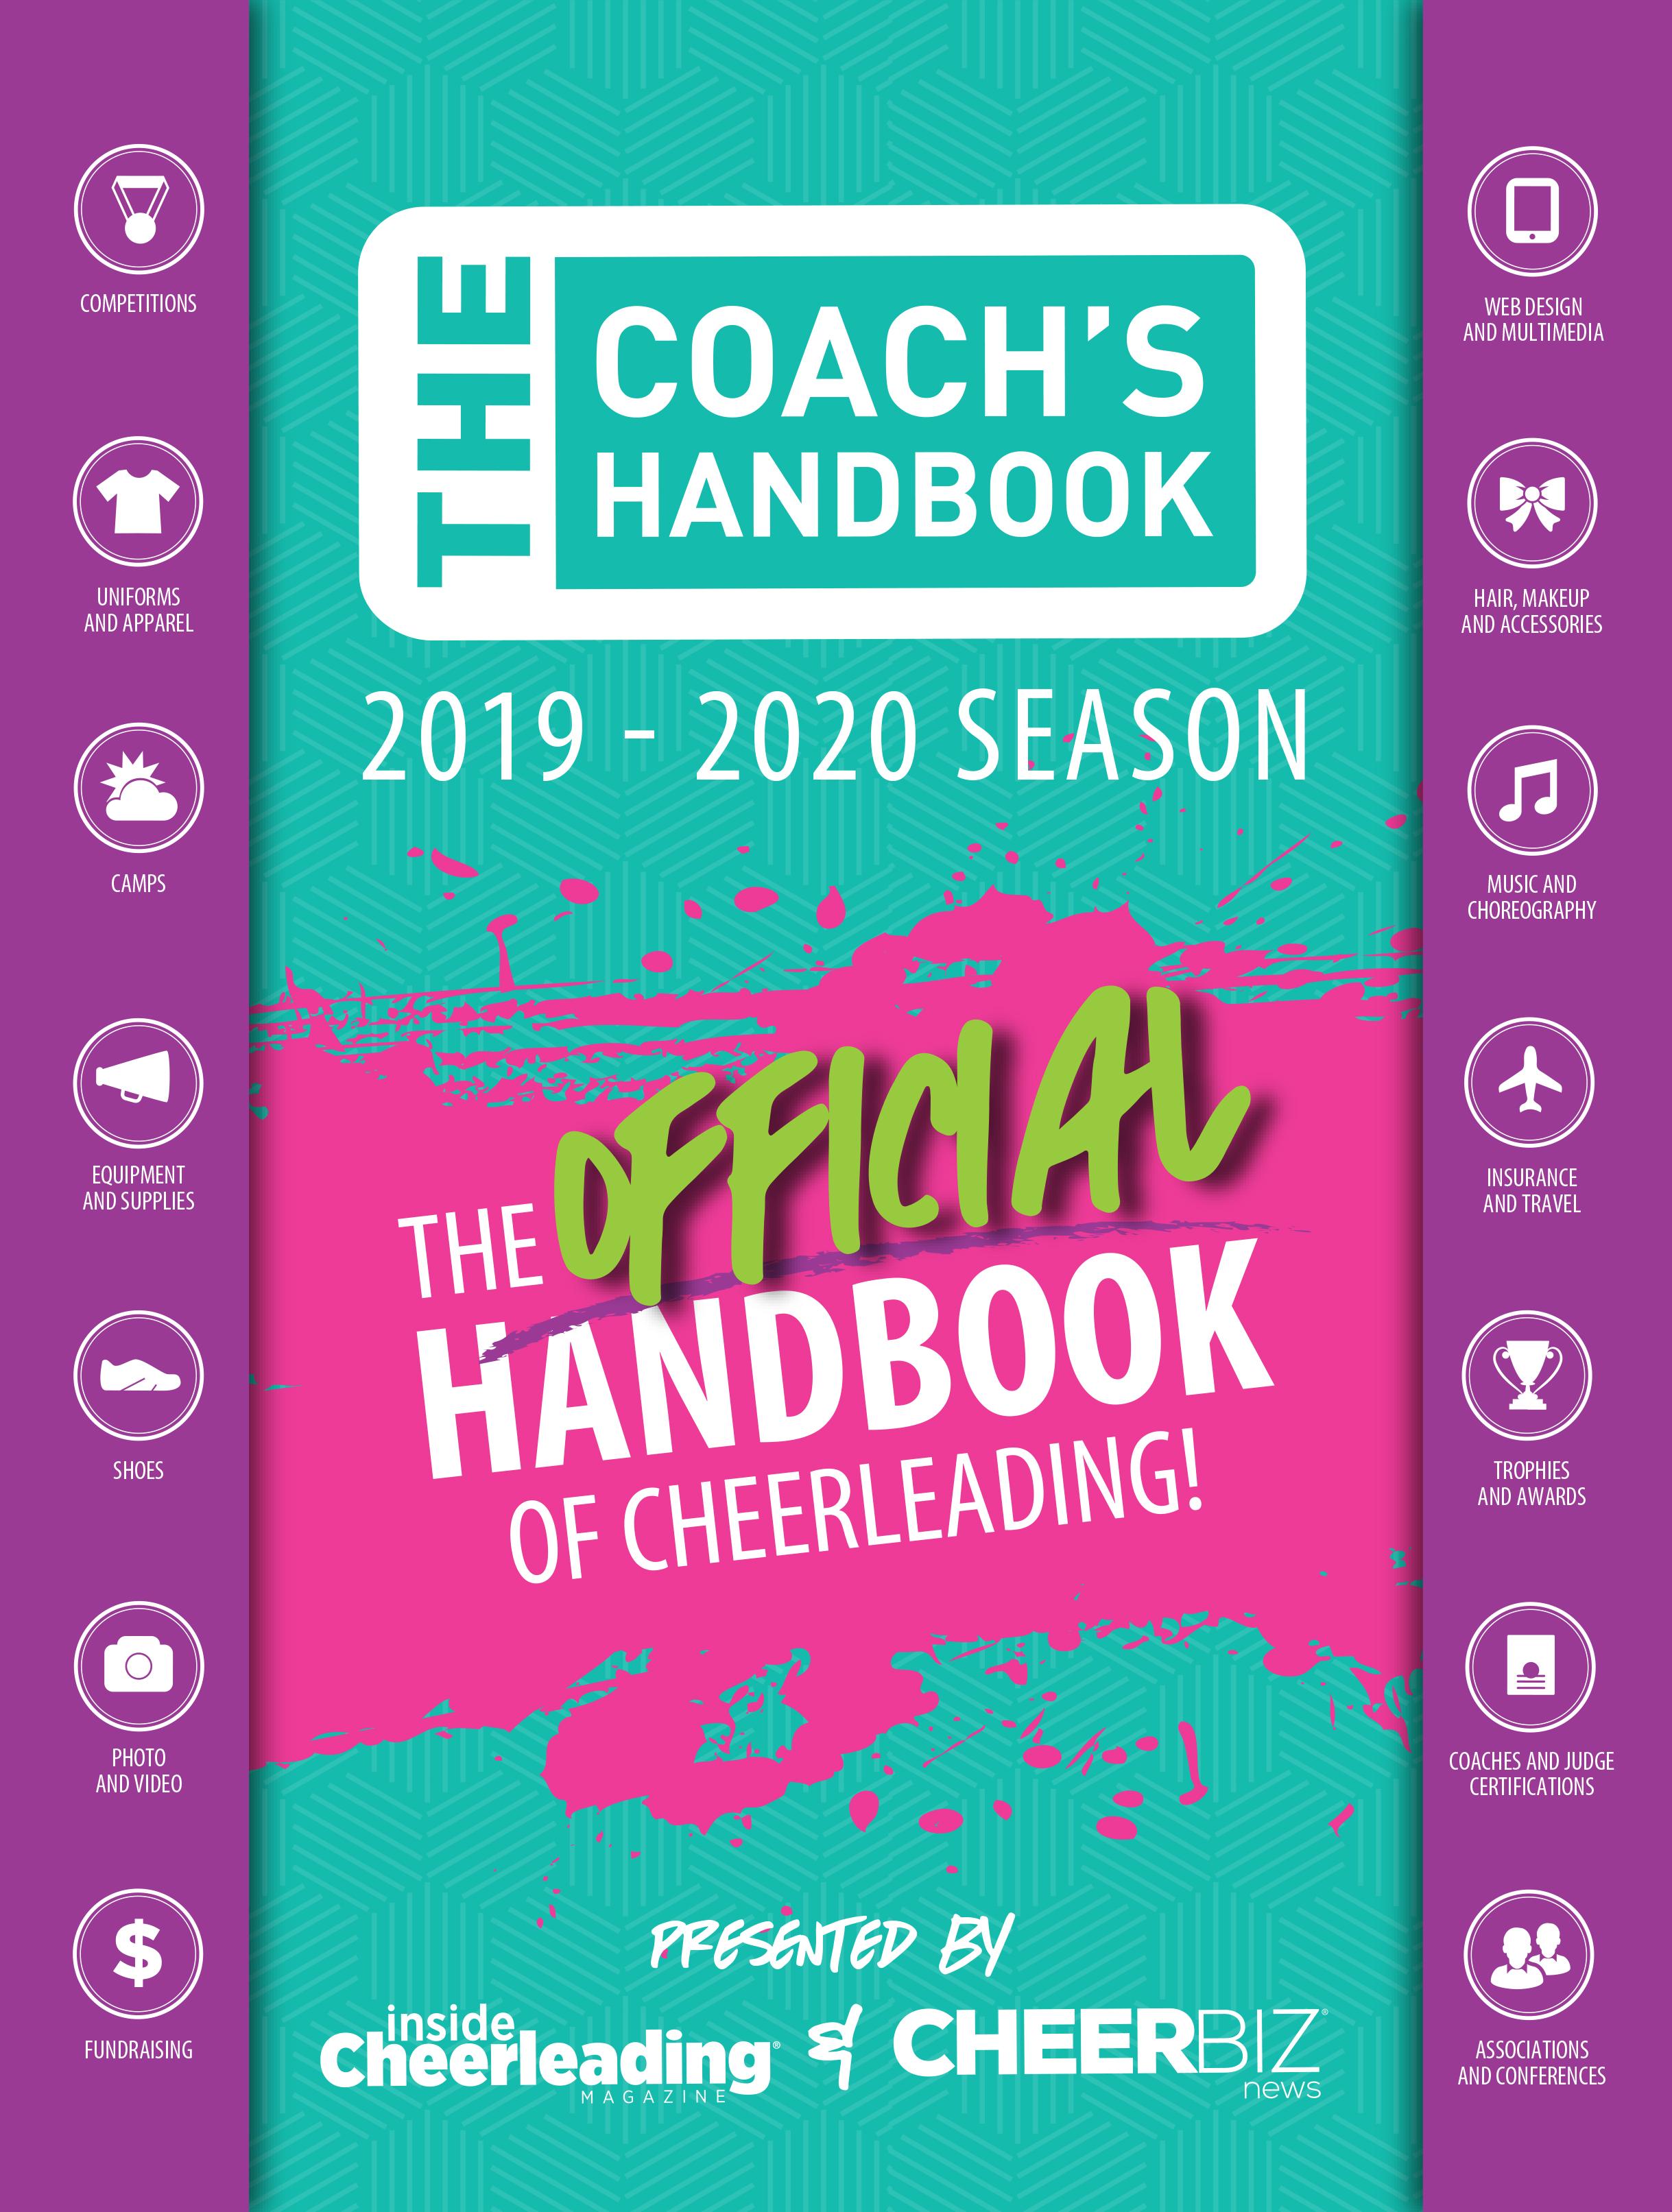 The 2017 Coach's Handbook